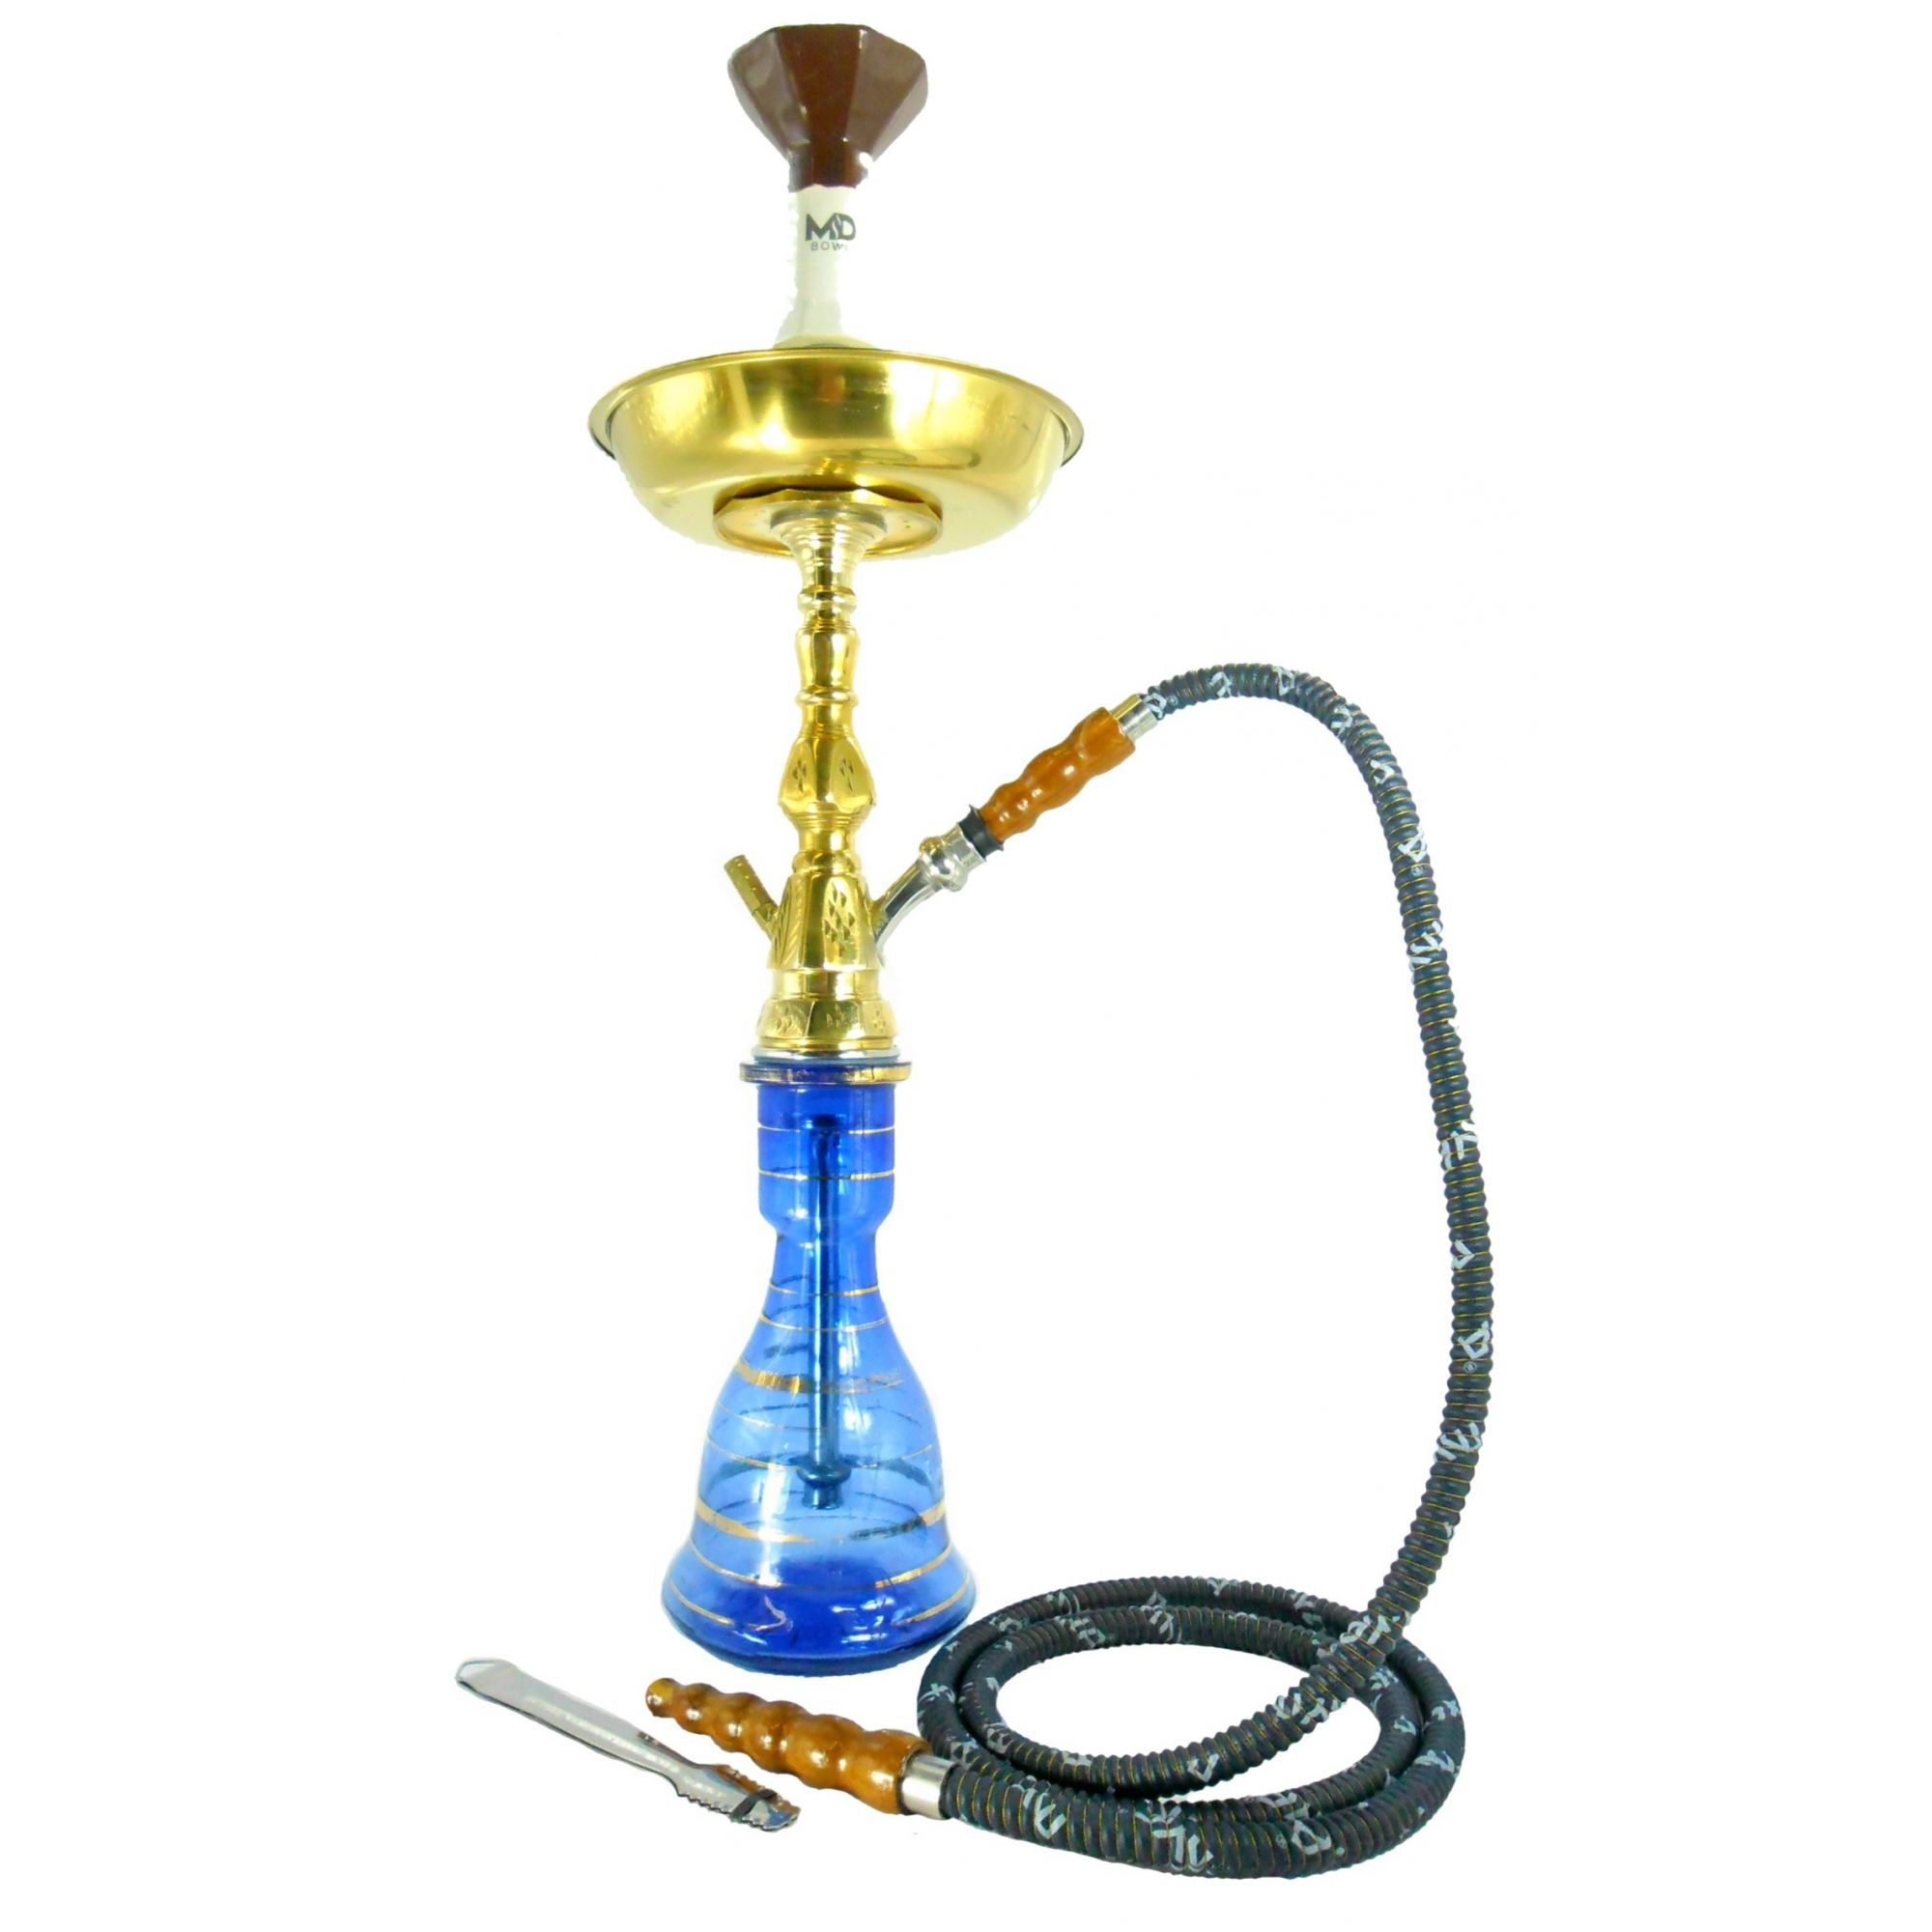 Narguile Egípcio PASHA KAMANJA 59cm, vaso azul, prato dourado, fornilho OCTA e mangueira de couro.